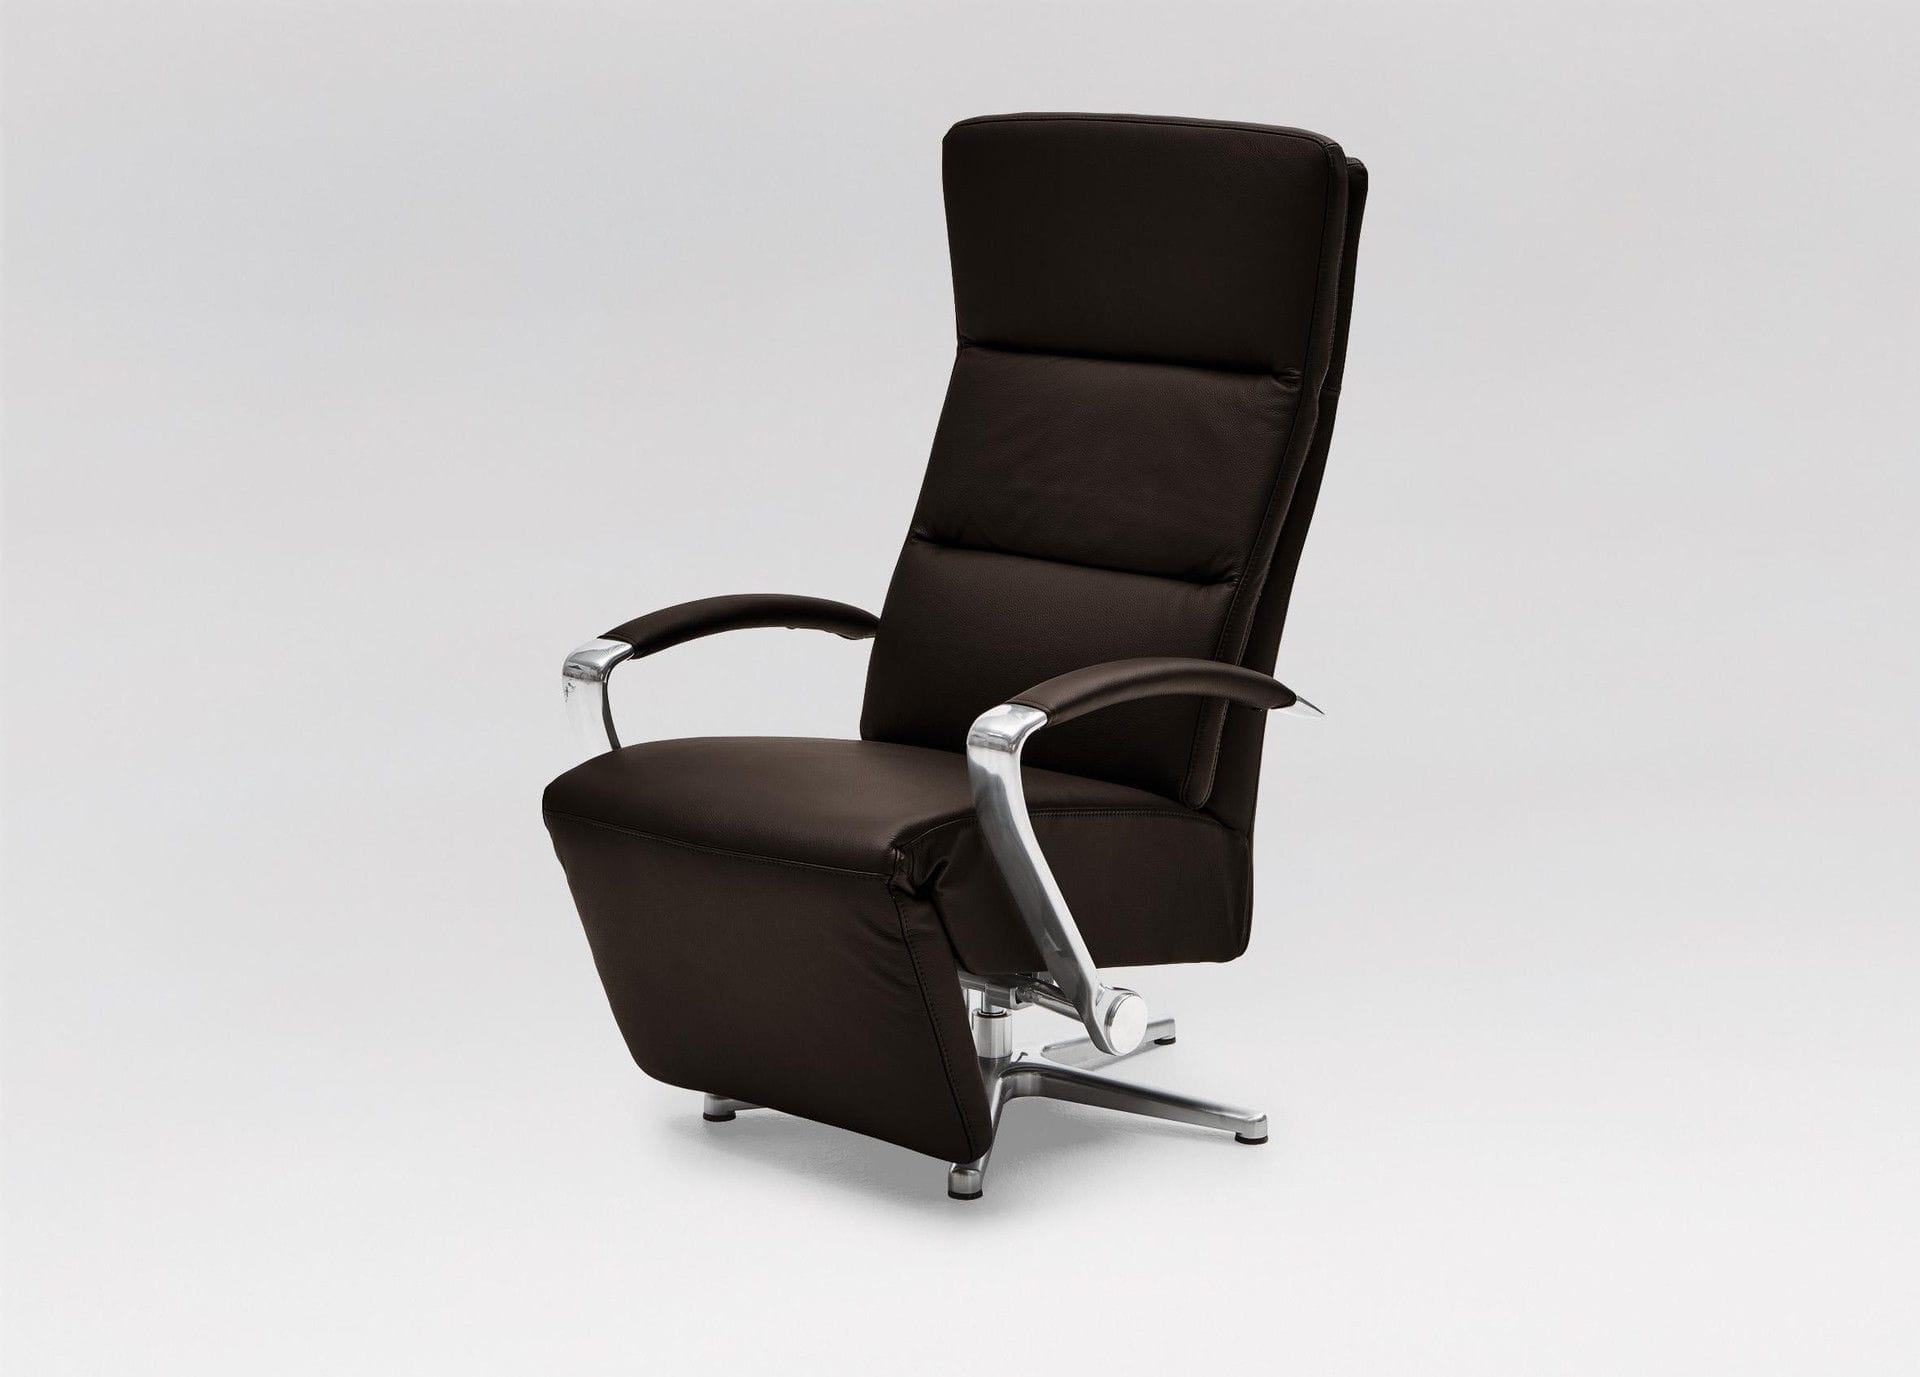 Moderner Sessel Stoff Metall Drehbar Mr 367 Musterring